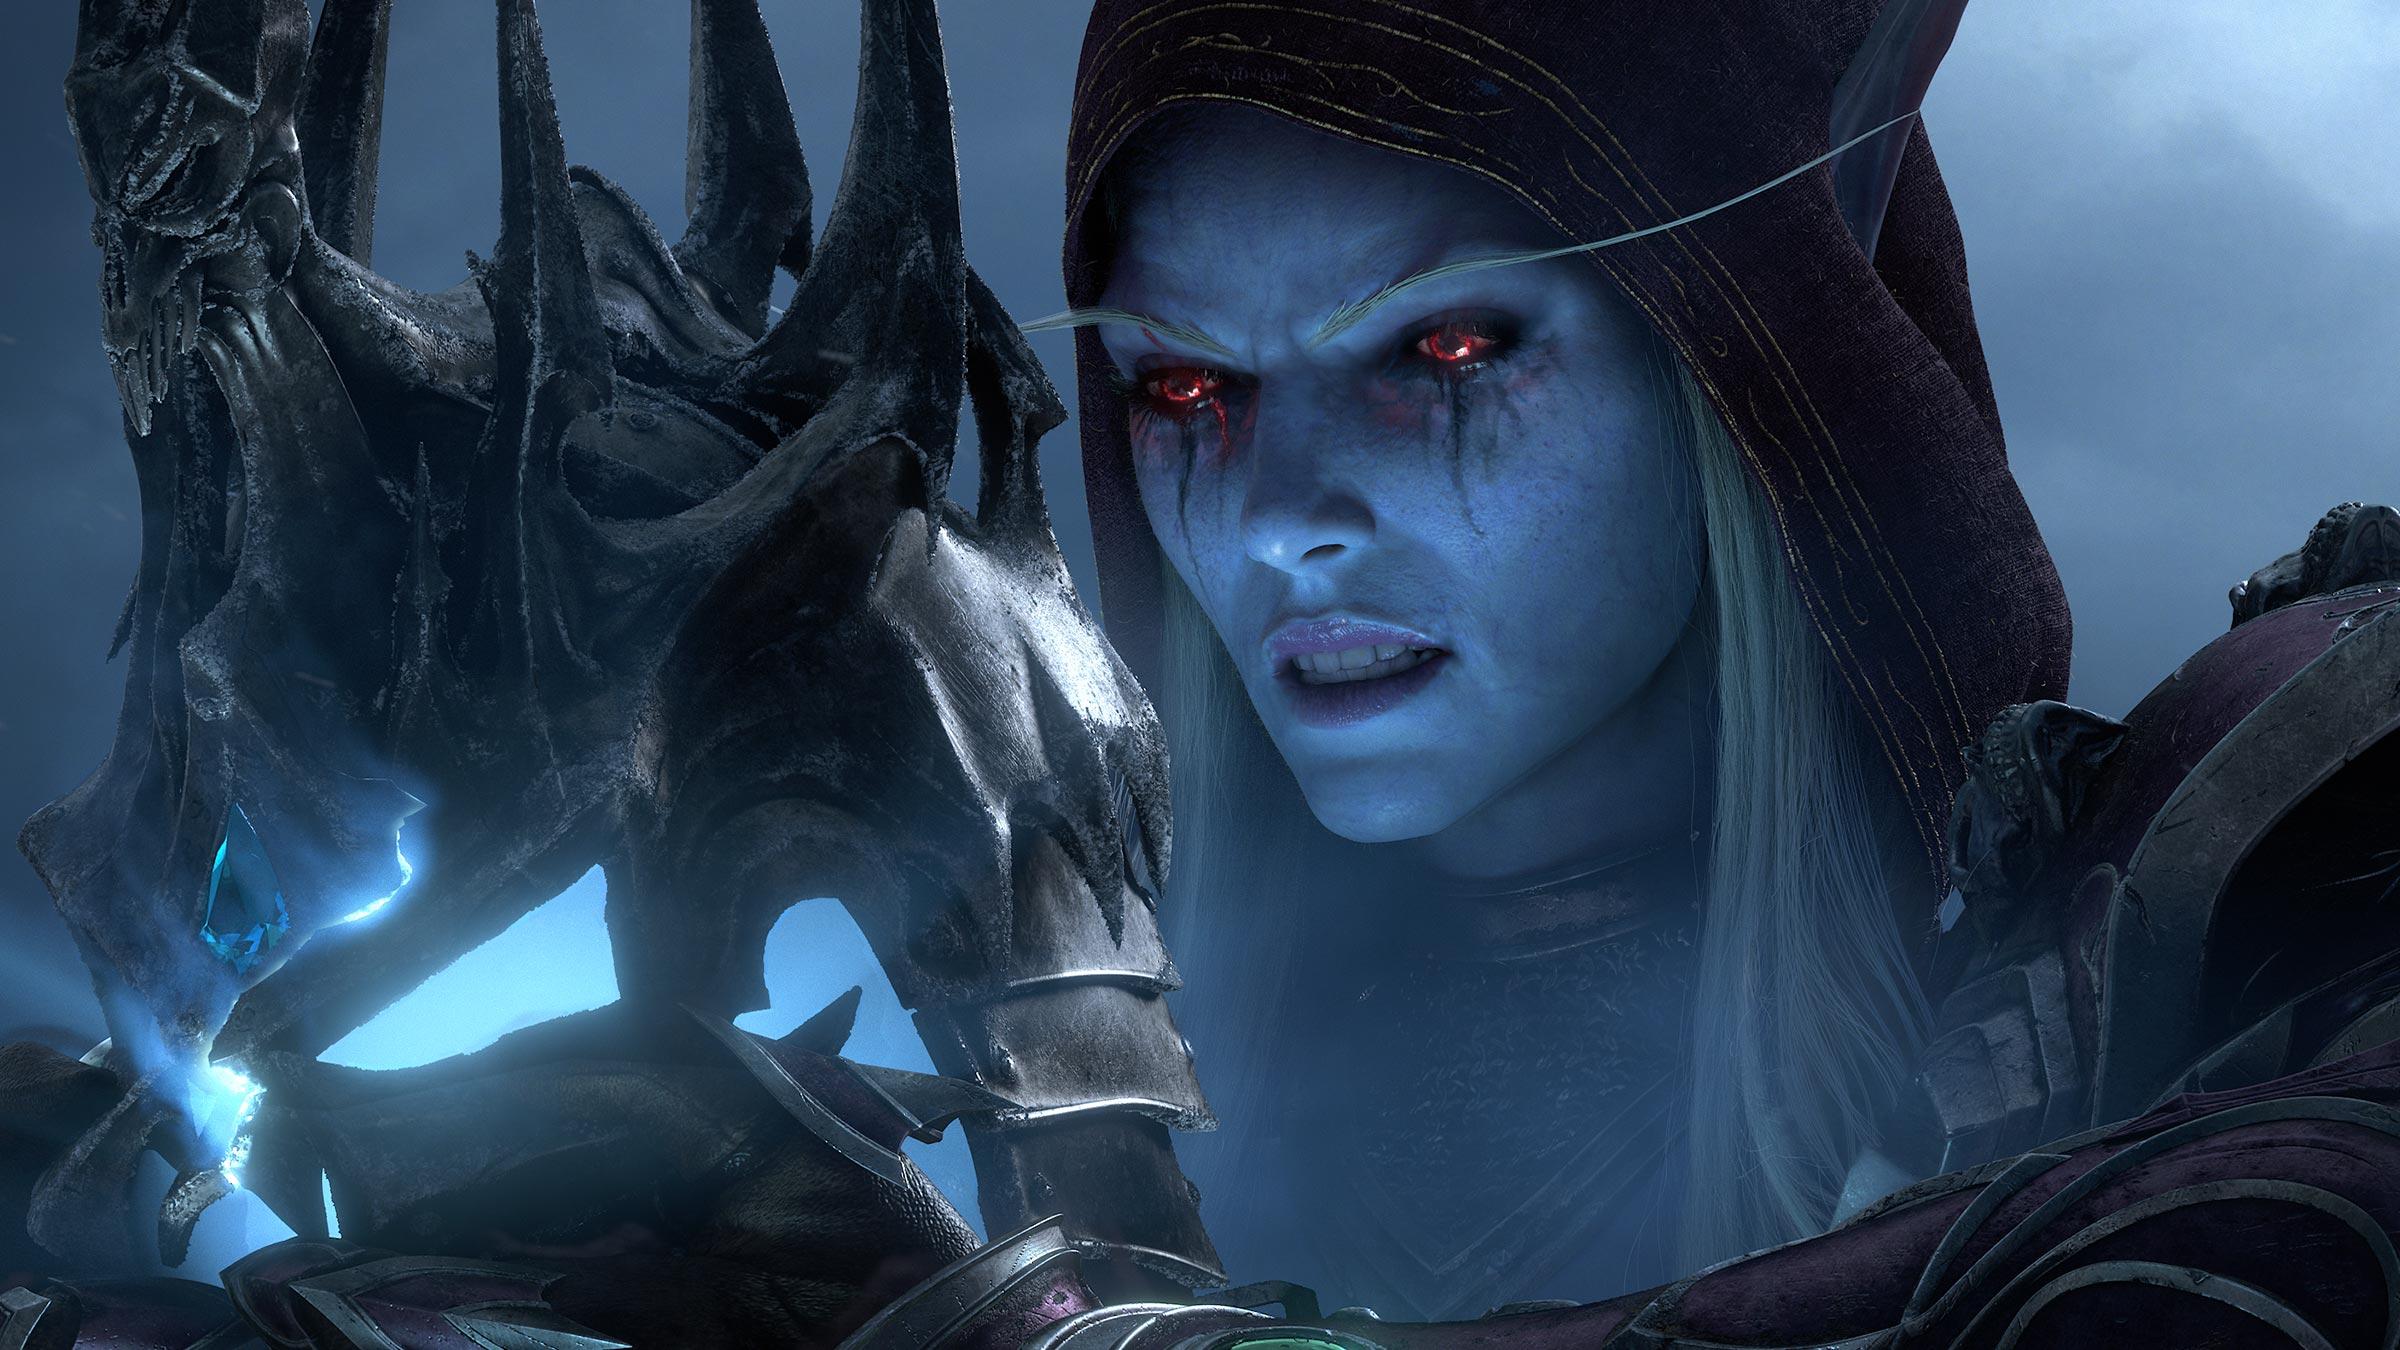 General 2400x1350 World of Warcraft Blizzard Entertainment CG cinematic World of Warcraft: Shadowlands Warcraft red eyes Sylvanas Windrunner